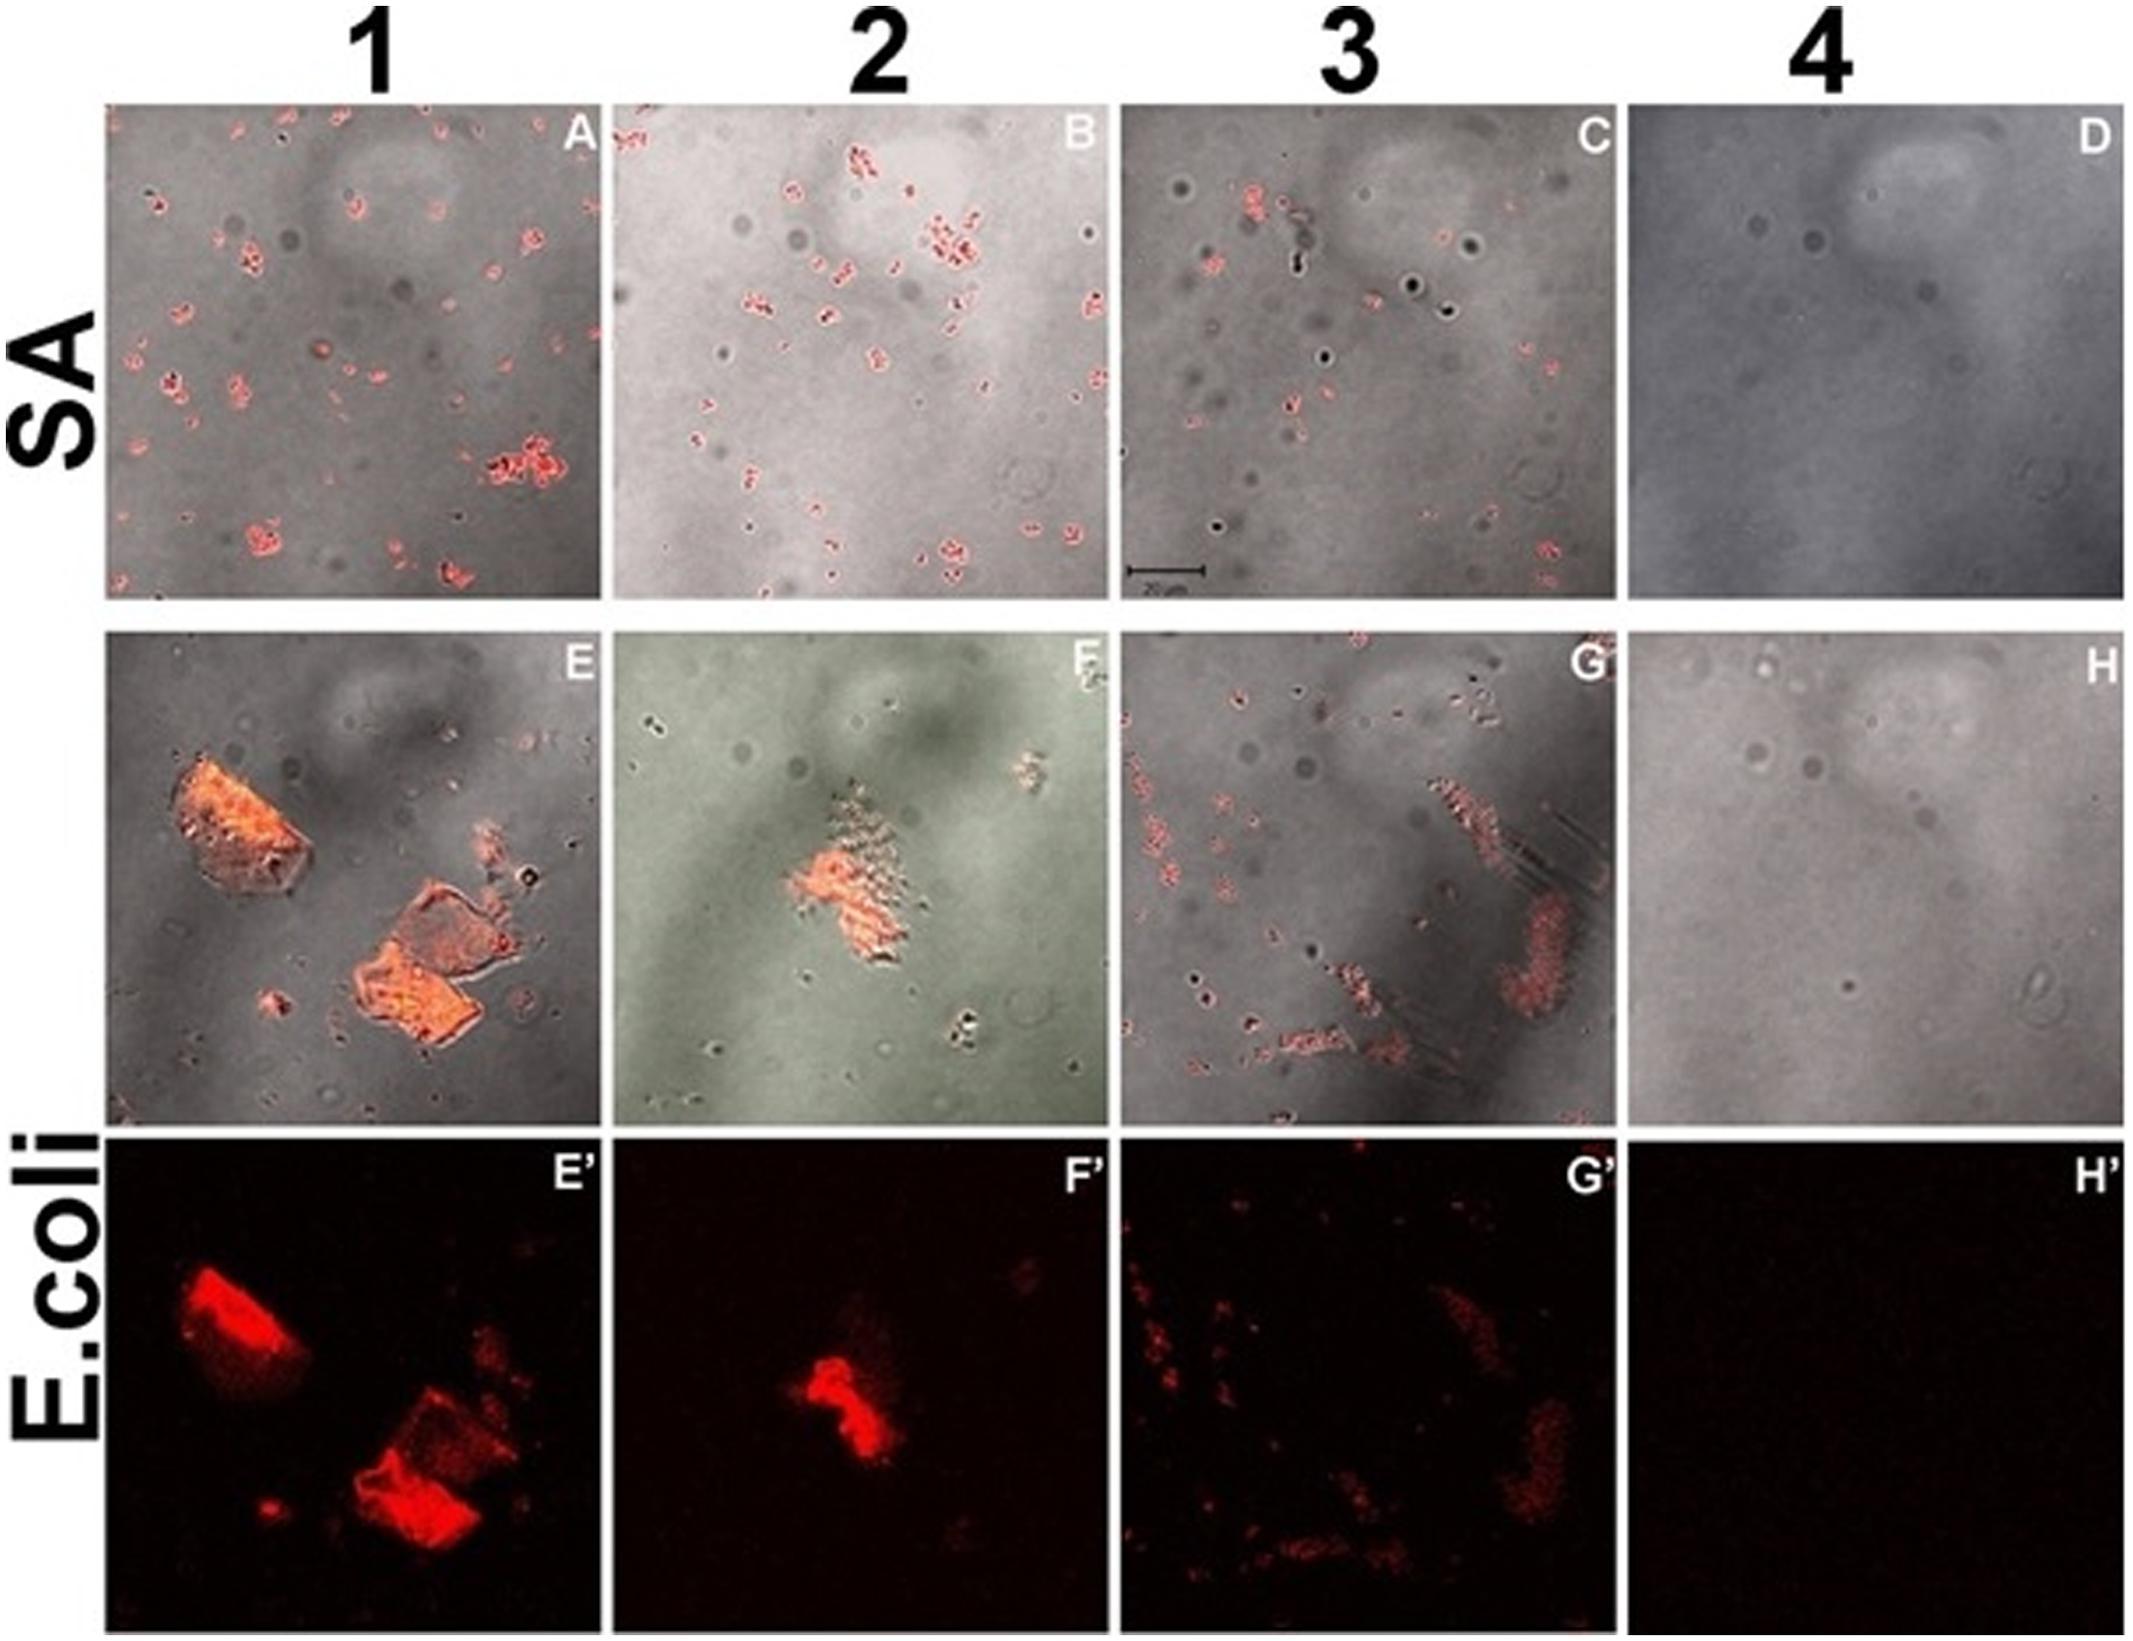 Frontiers | Curcumin Quantum Dots Mediated Degradation of Bacterial